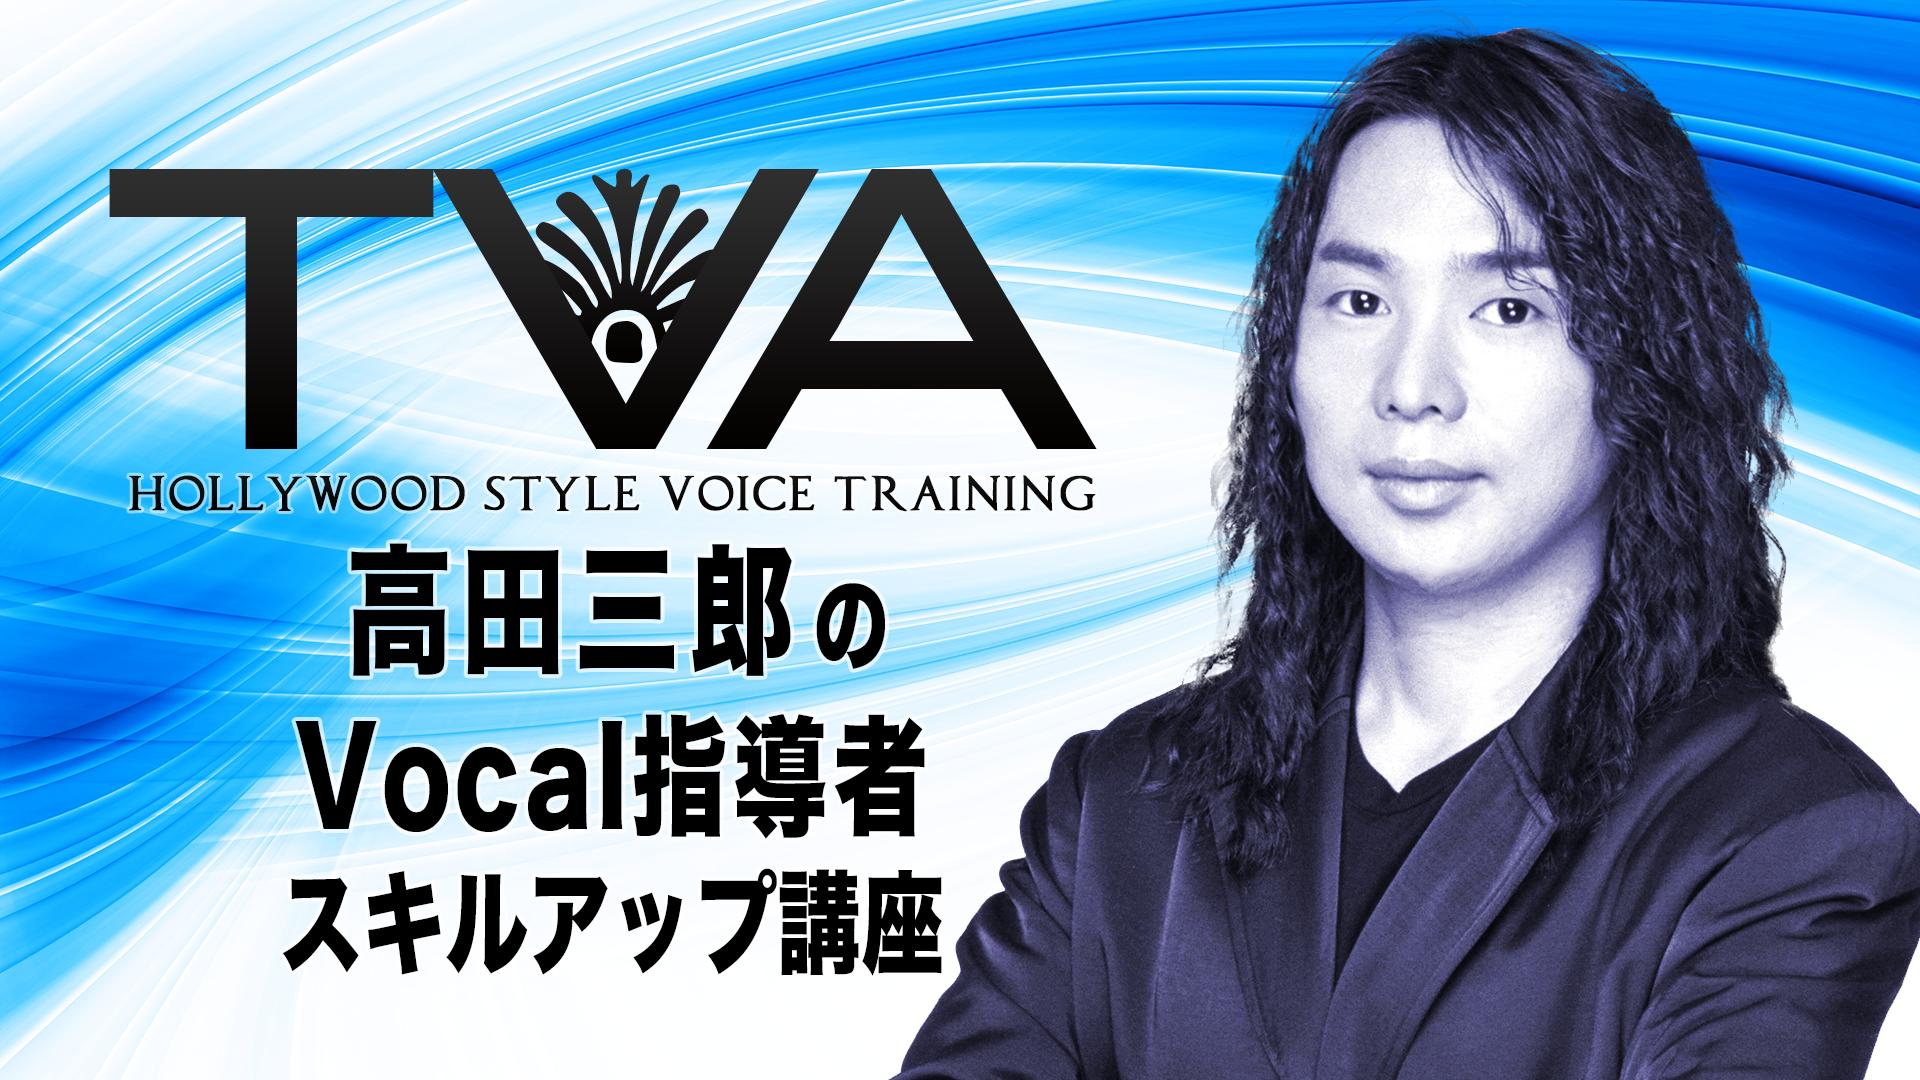 TVA-高田三郎のVocal指導者スキルアップ講座